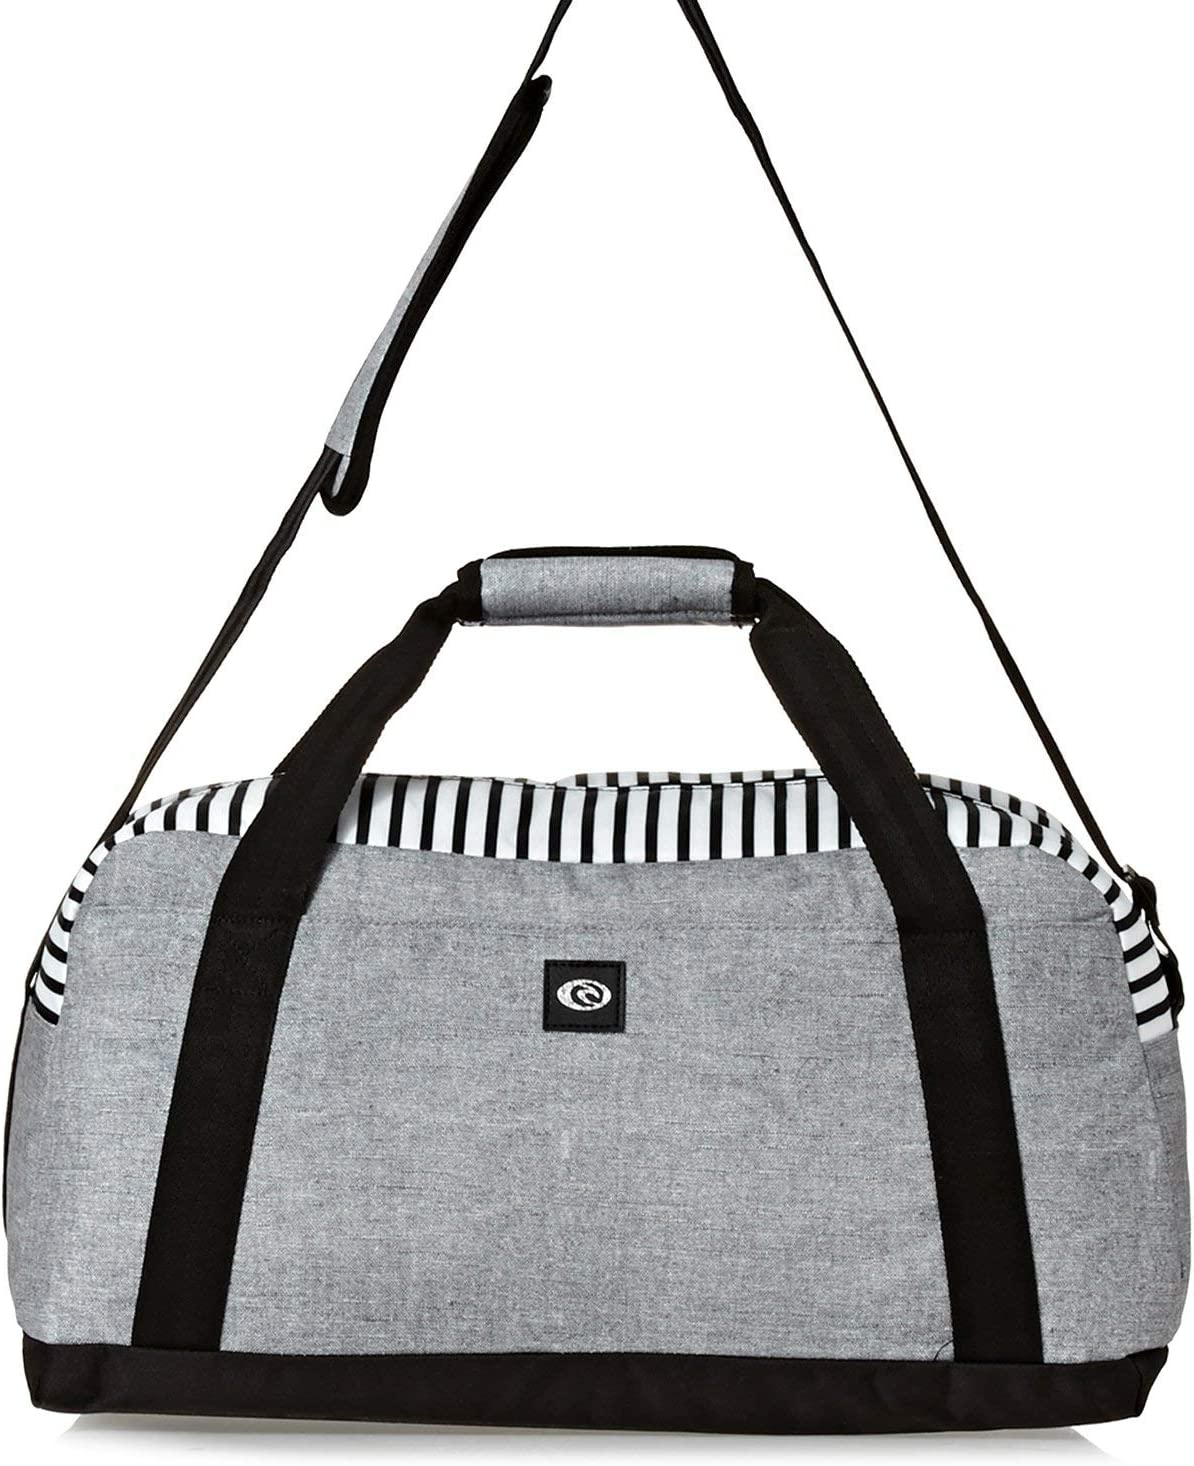 Rip Curl Mid Duffle Essentials Duffle Bag One Size Black